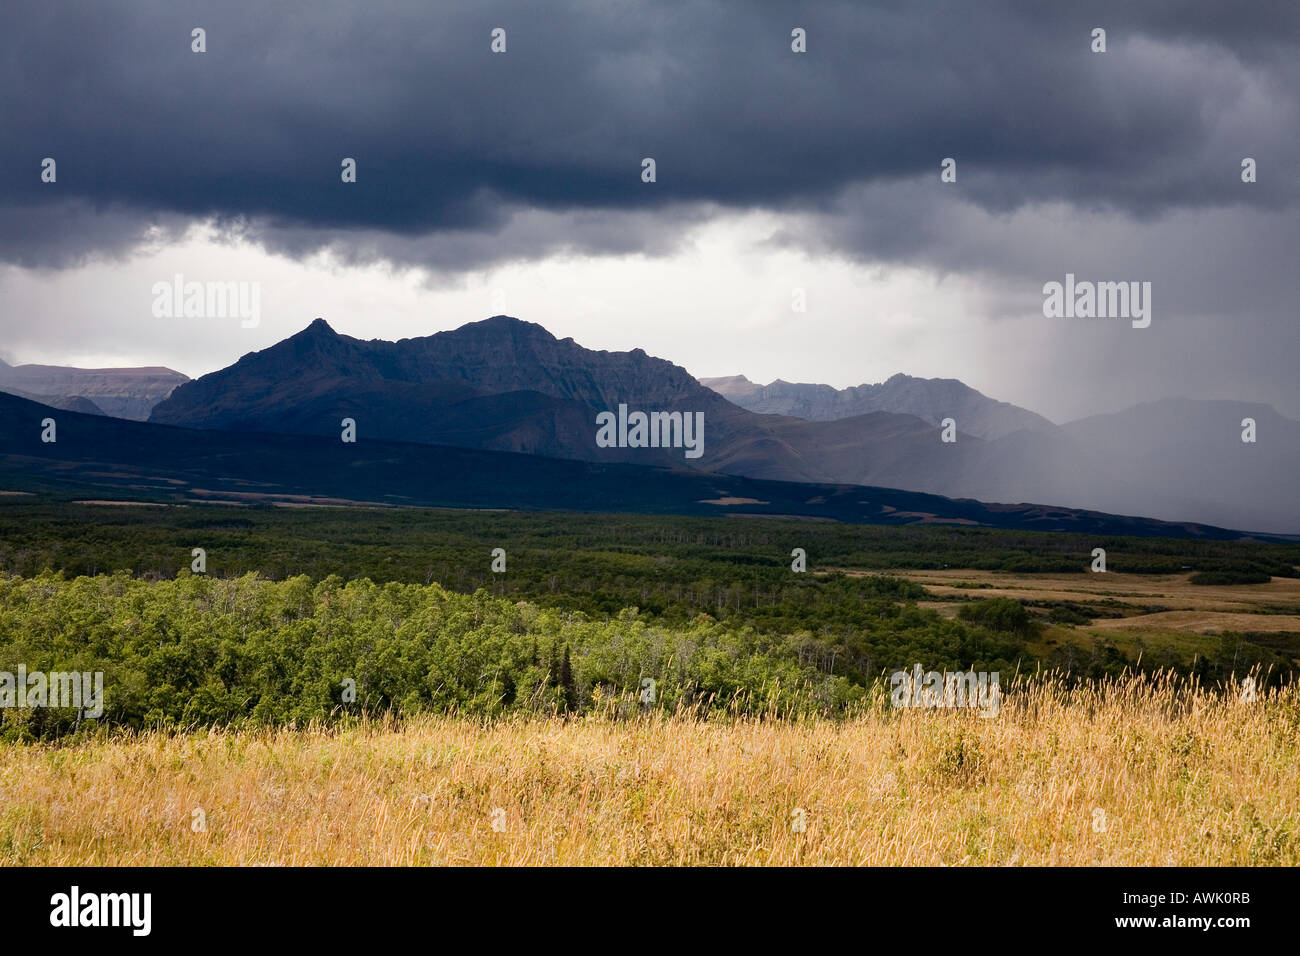 Rain storm over Spread Eagle mountain in Canadian Rockies  Alberta Canada - Stock Image